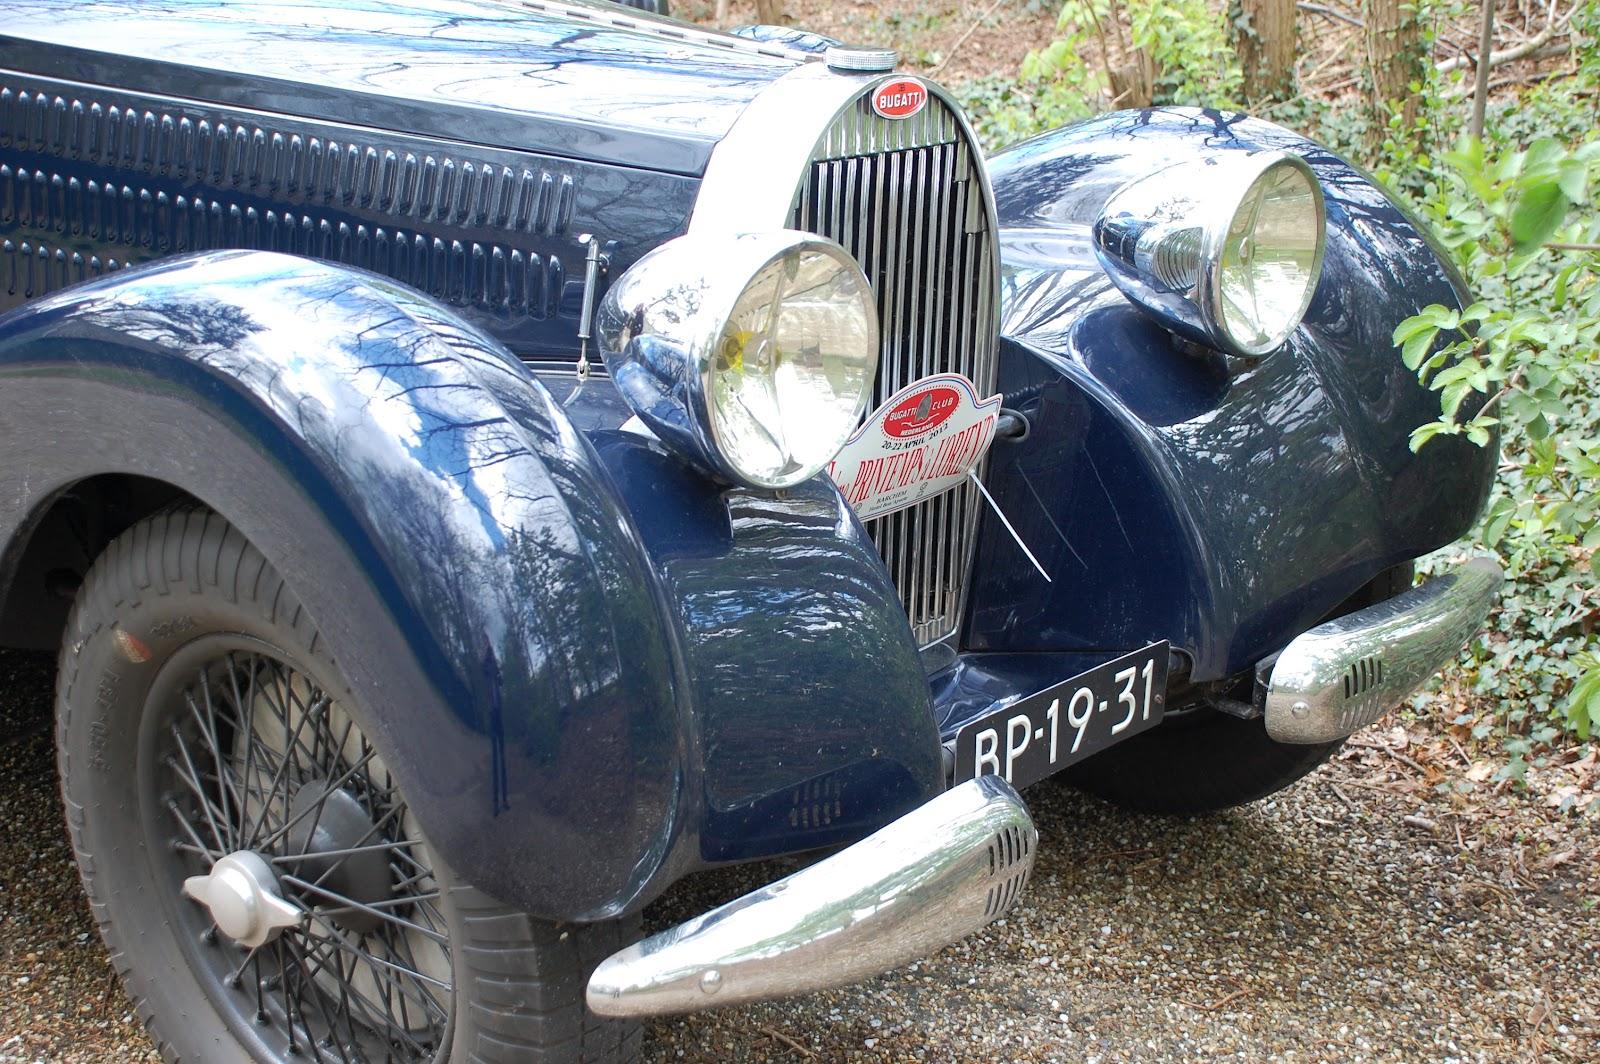 Janwib.blogspot Oldtimers en Meer : Bugatti's bij De Pot in Markelo: janwib.blogspot.com/2012/04/bugattis-bij-de-pot-in-markelo.html